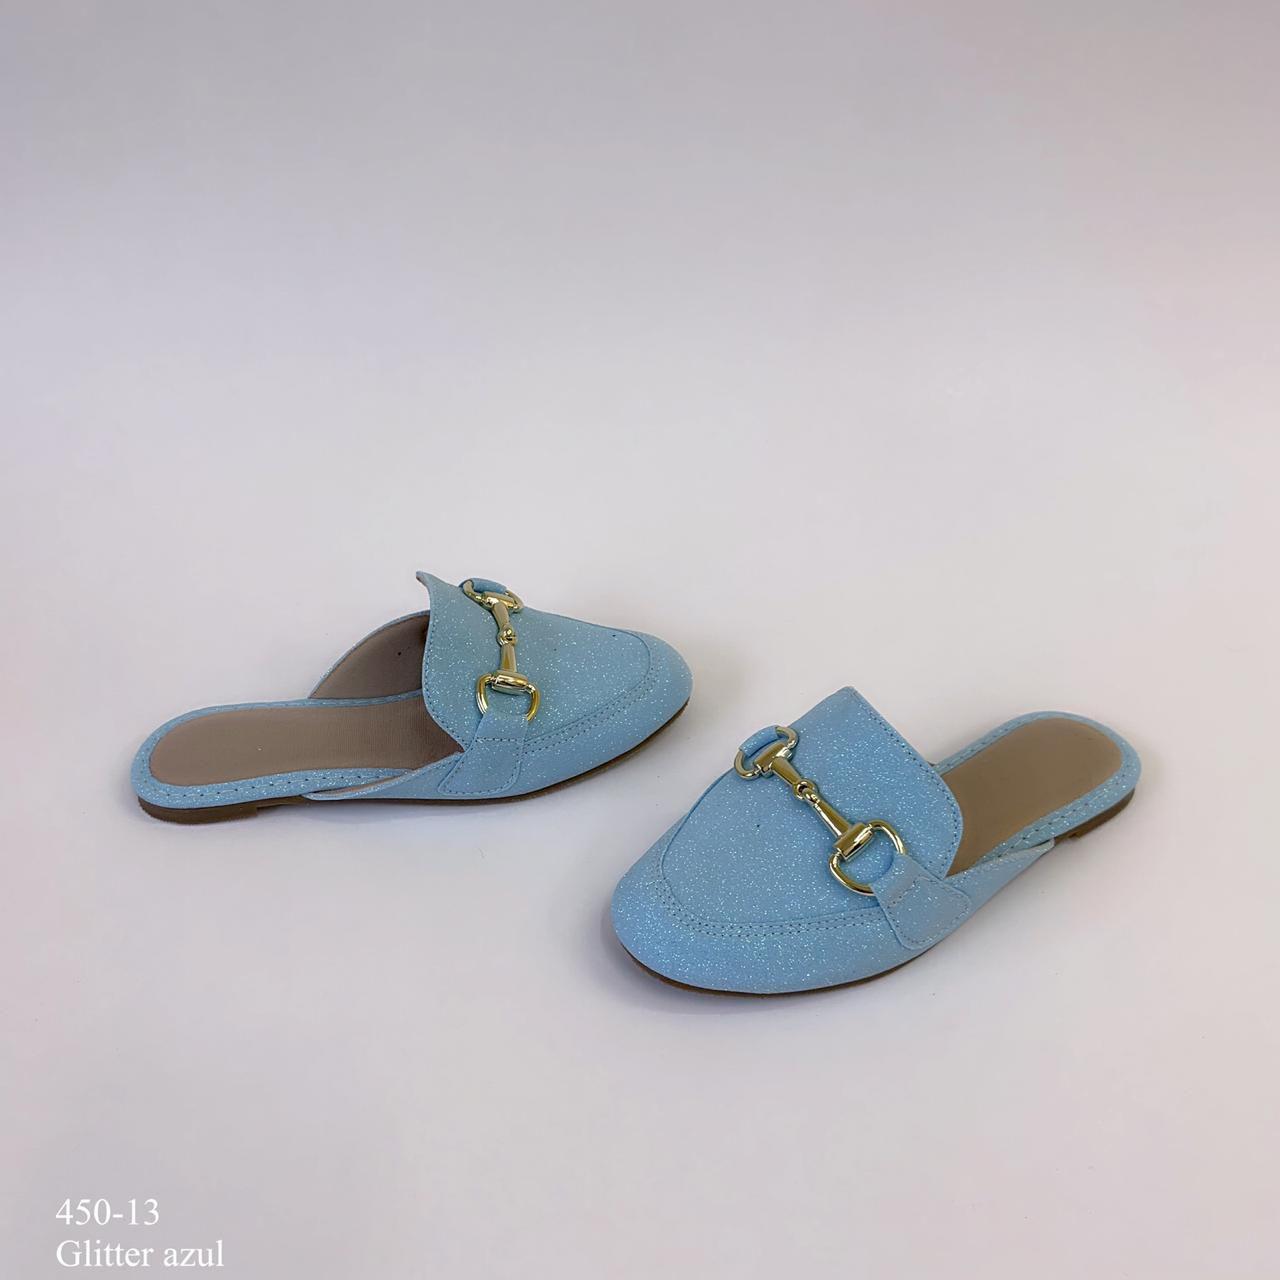 Mule  mamãe & filha Azul Glitter com Fivela | D-450-13